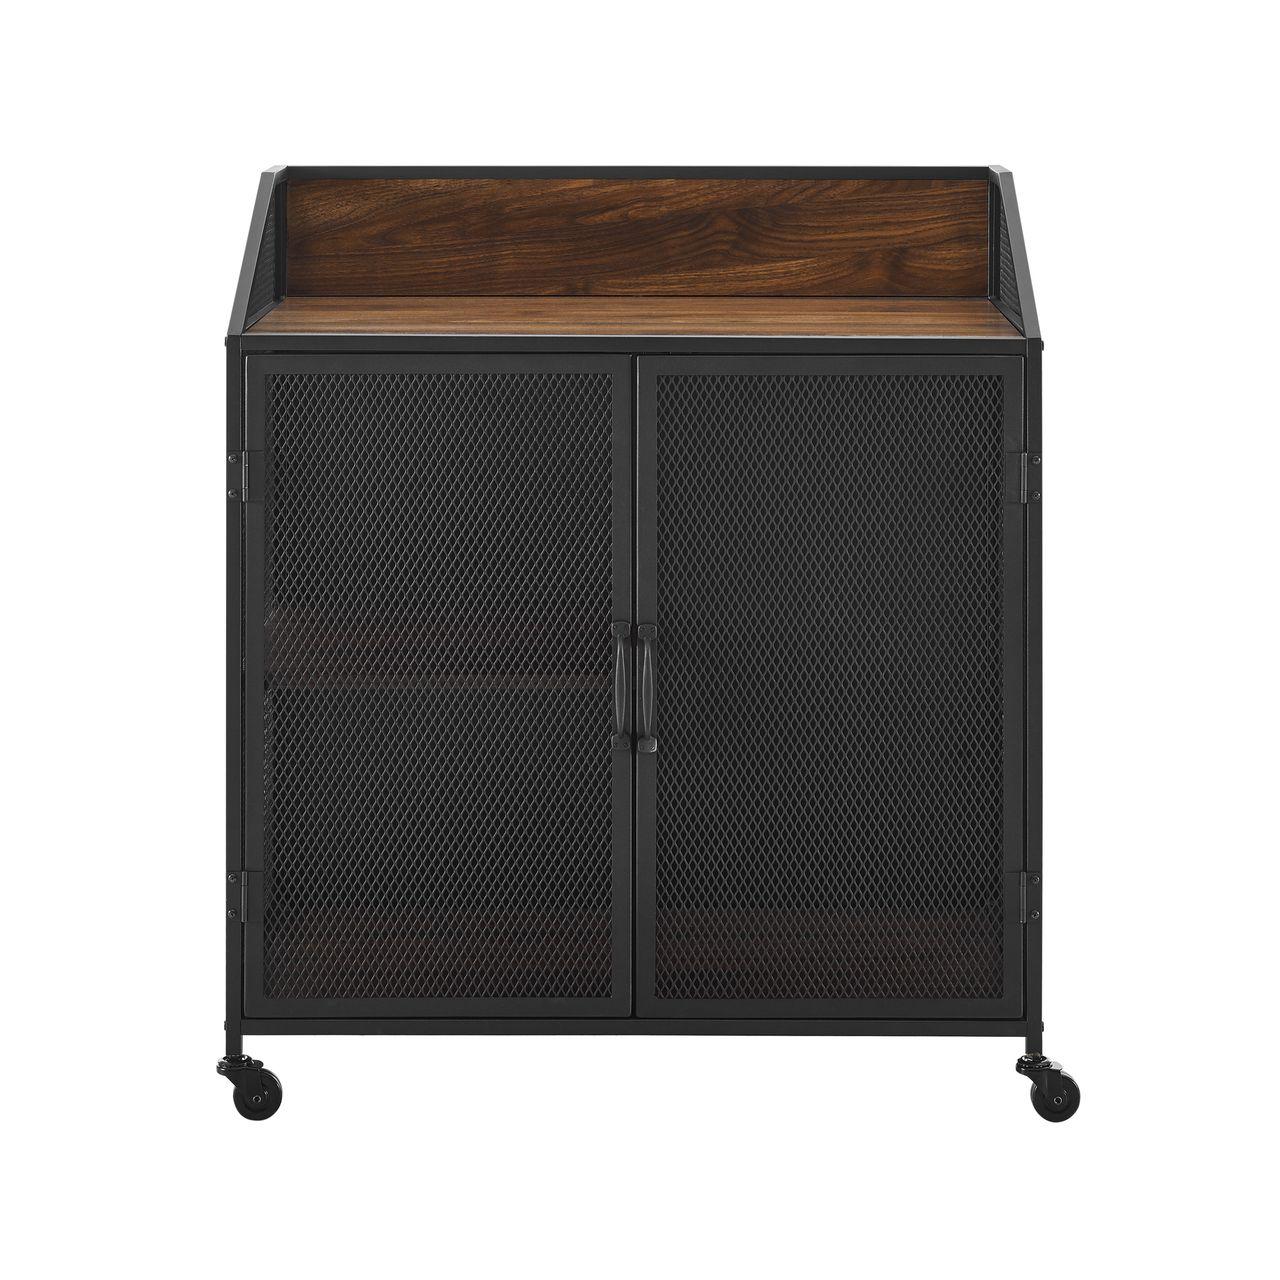 "Walker Edison 33"" Industrial Bar Cabinet - Dark Walnut"